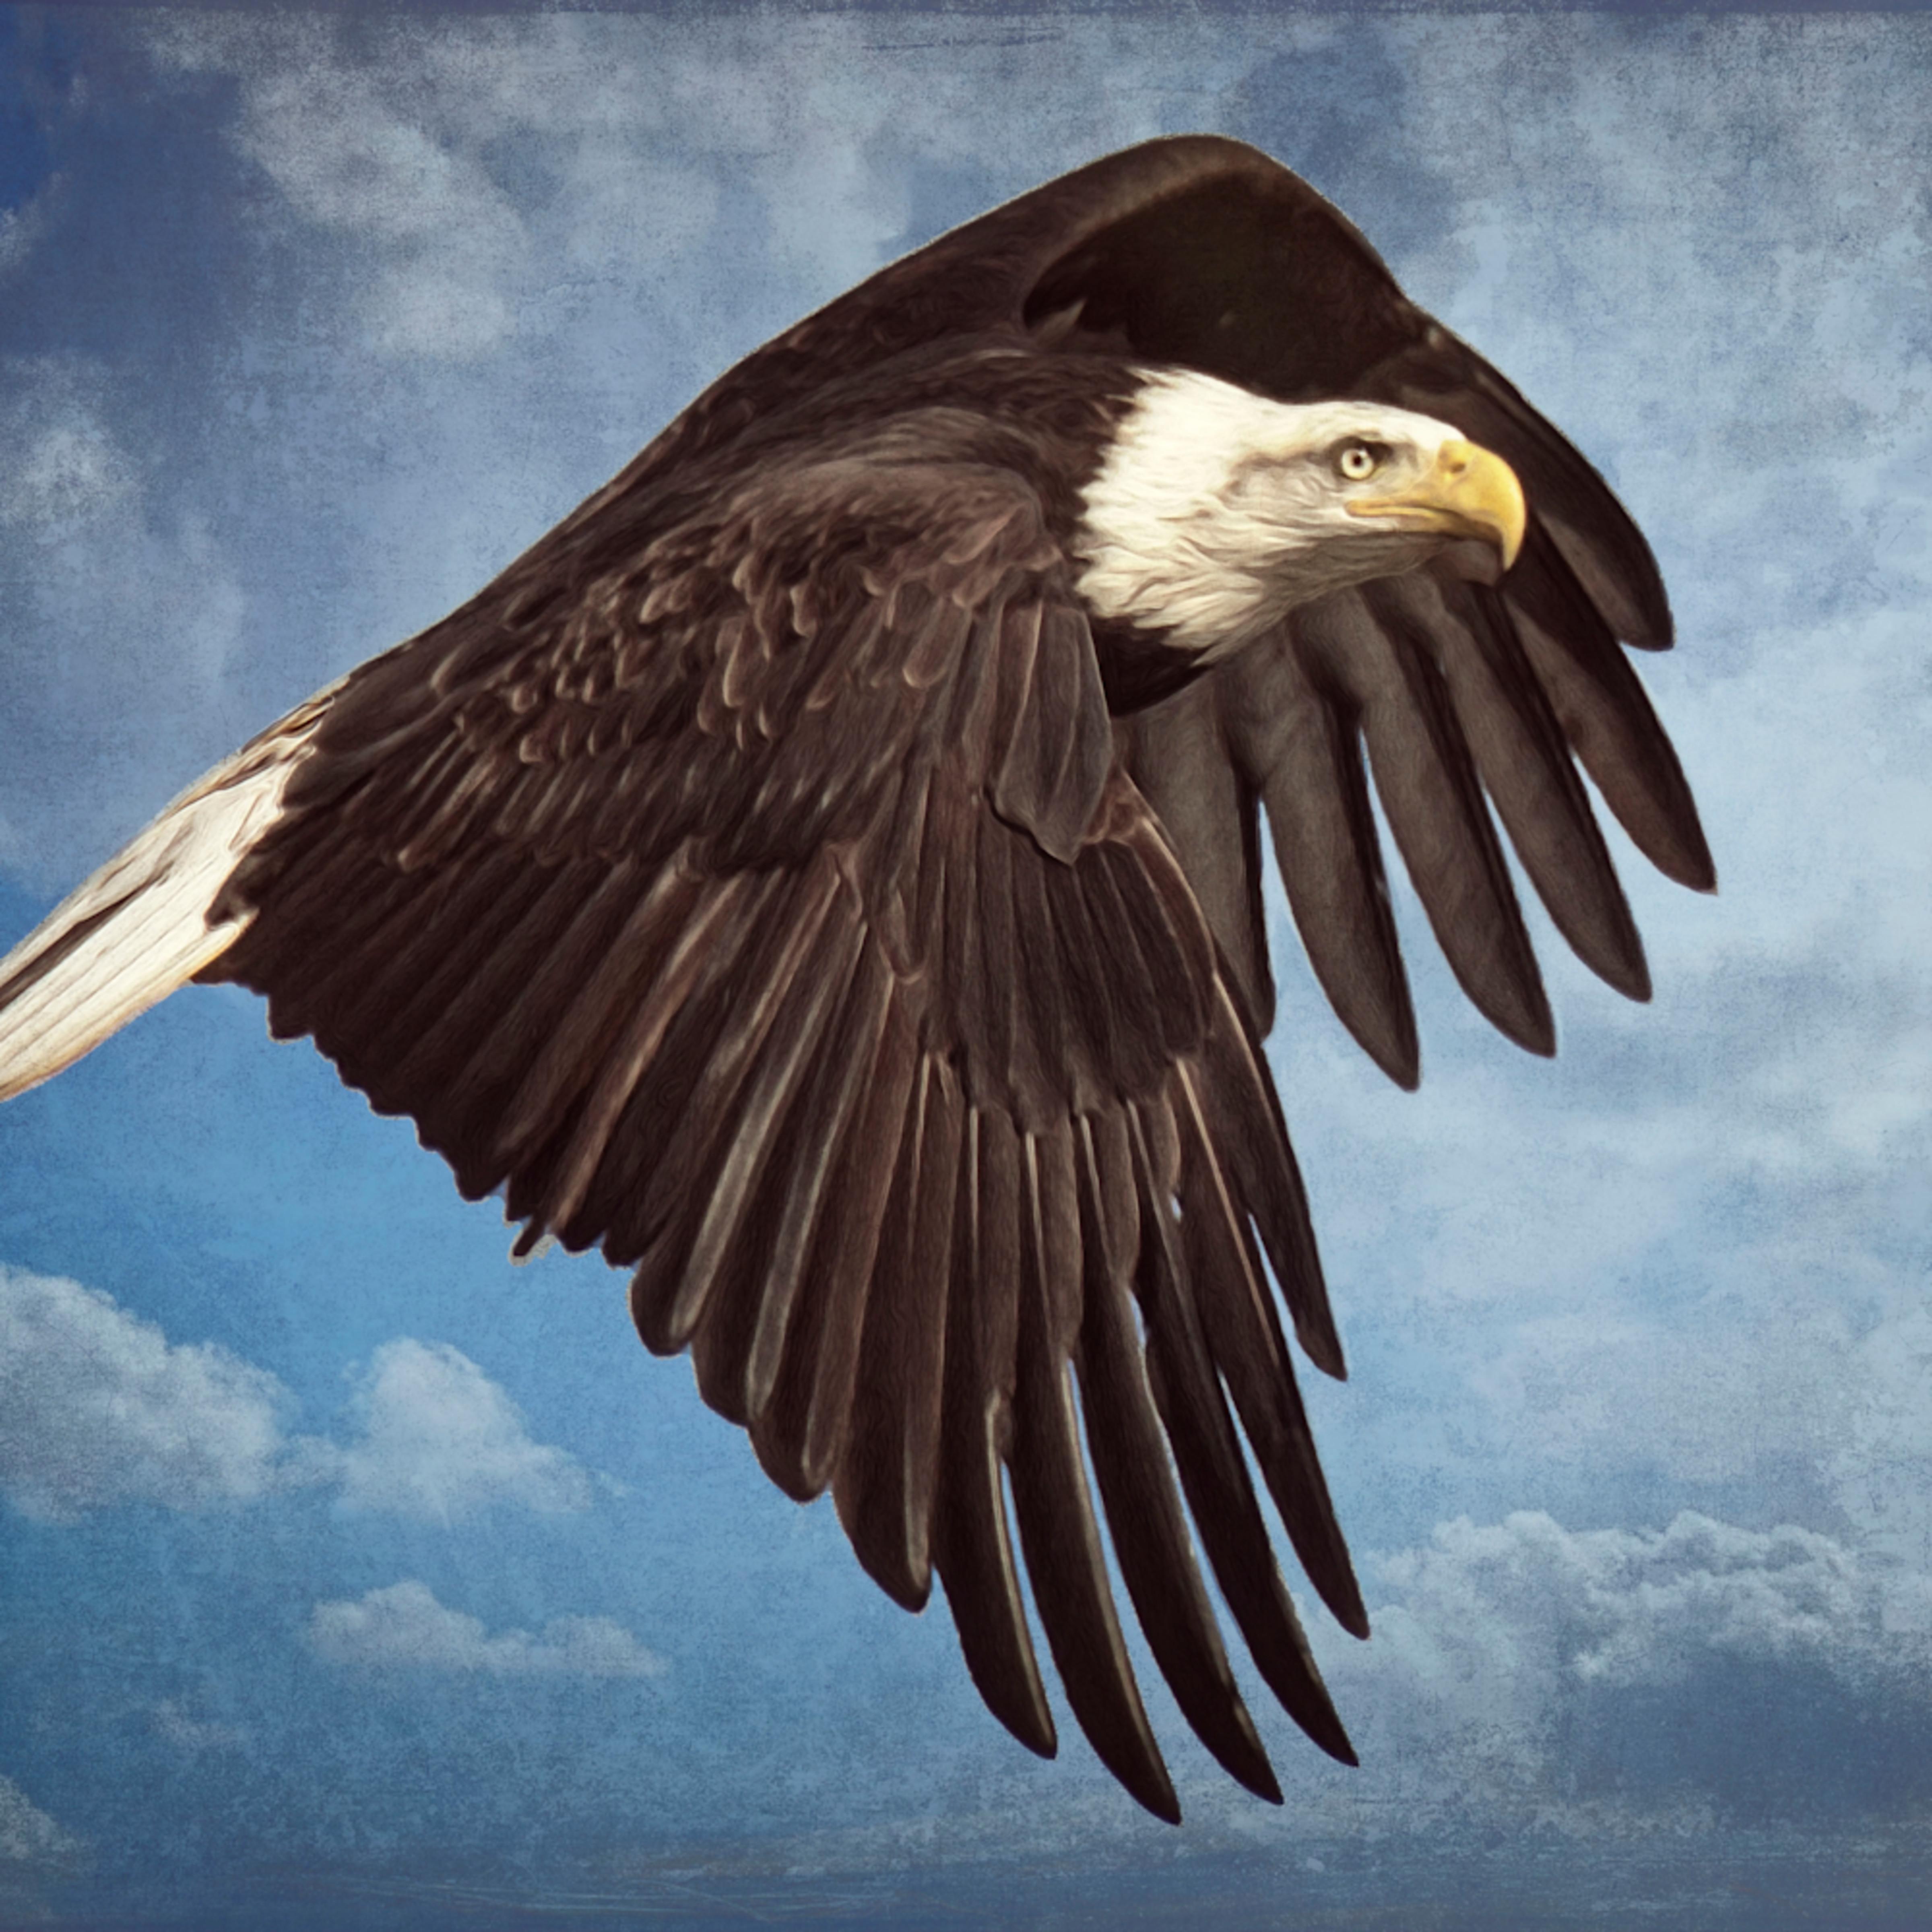 Banking eagle2 cfwz8h